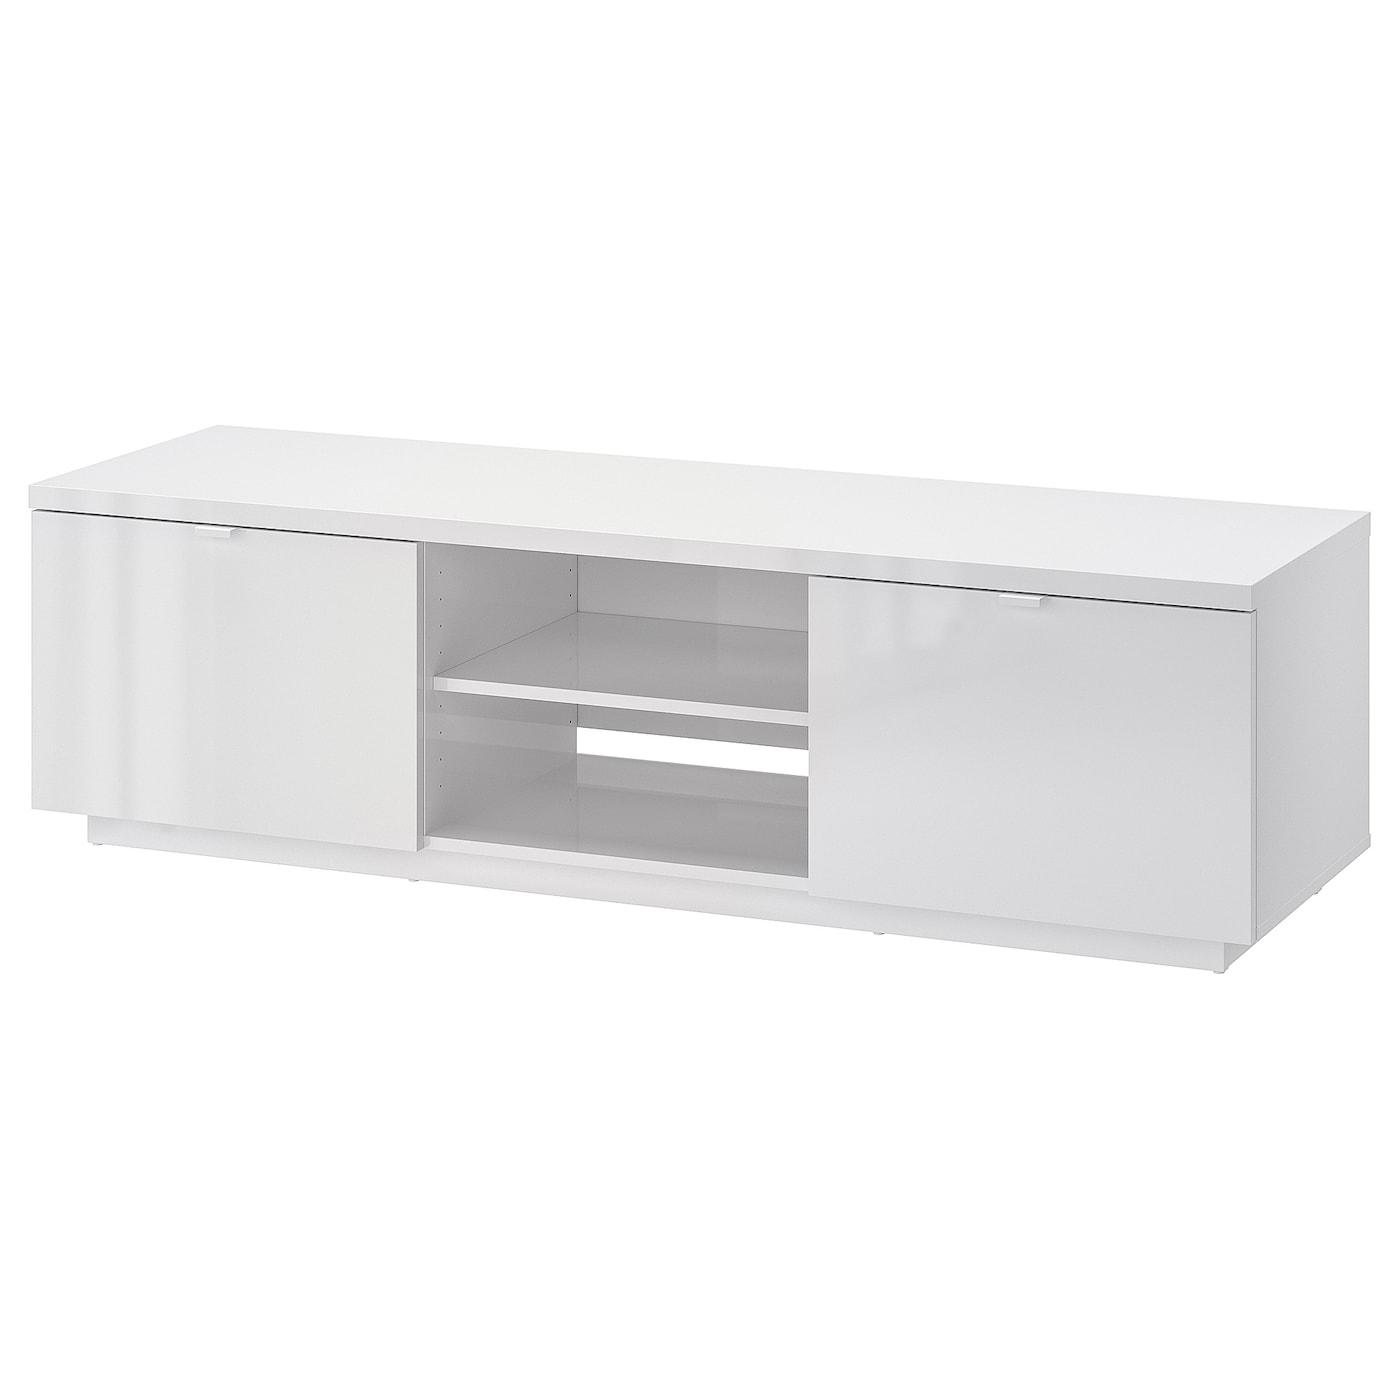 BYÅS Tv bänk högglans vit 160x42x45 cm